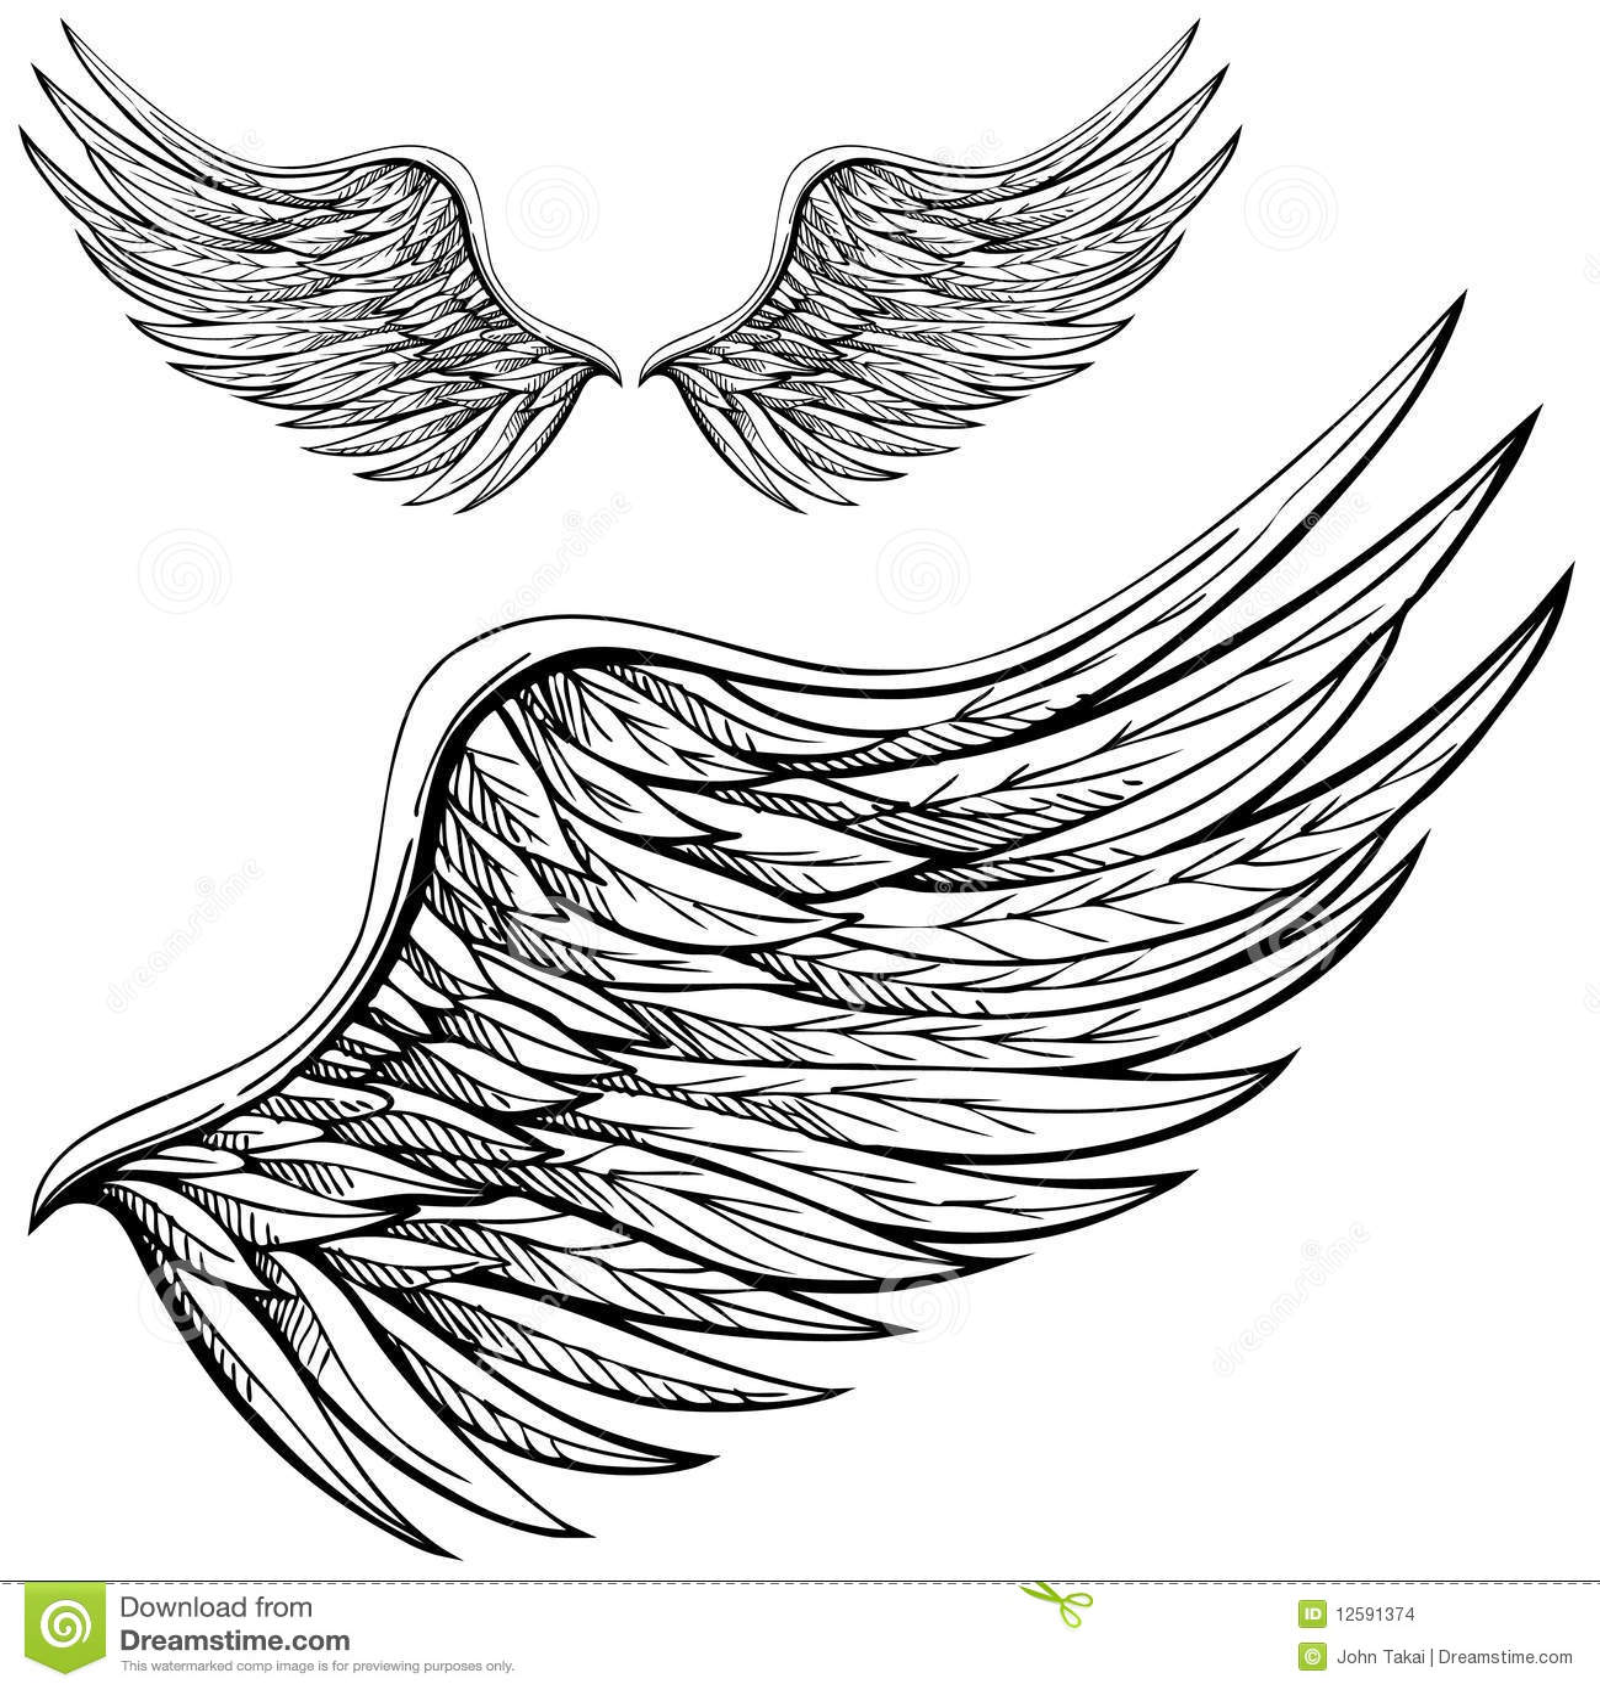 Aile d 39 ange de dessin anim images stock image 12591374 - Dessin d ange ...